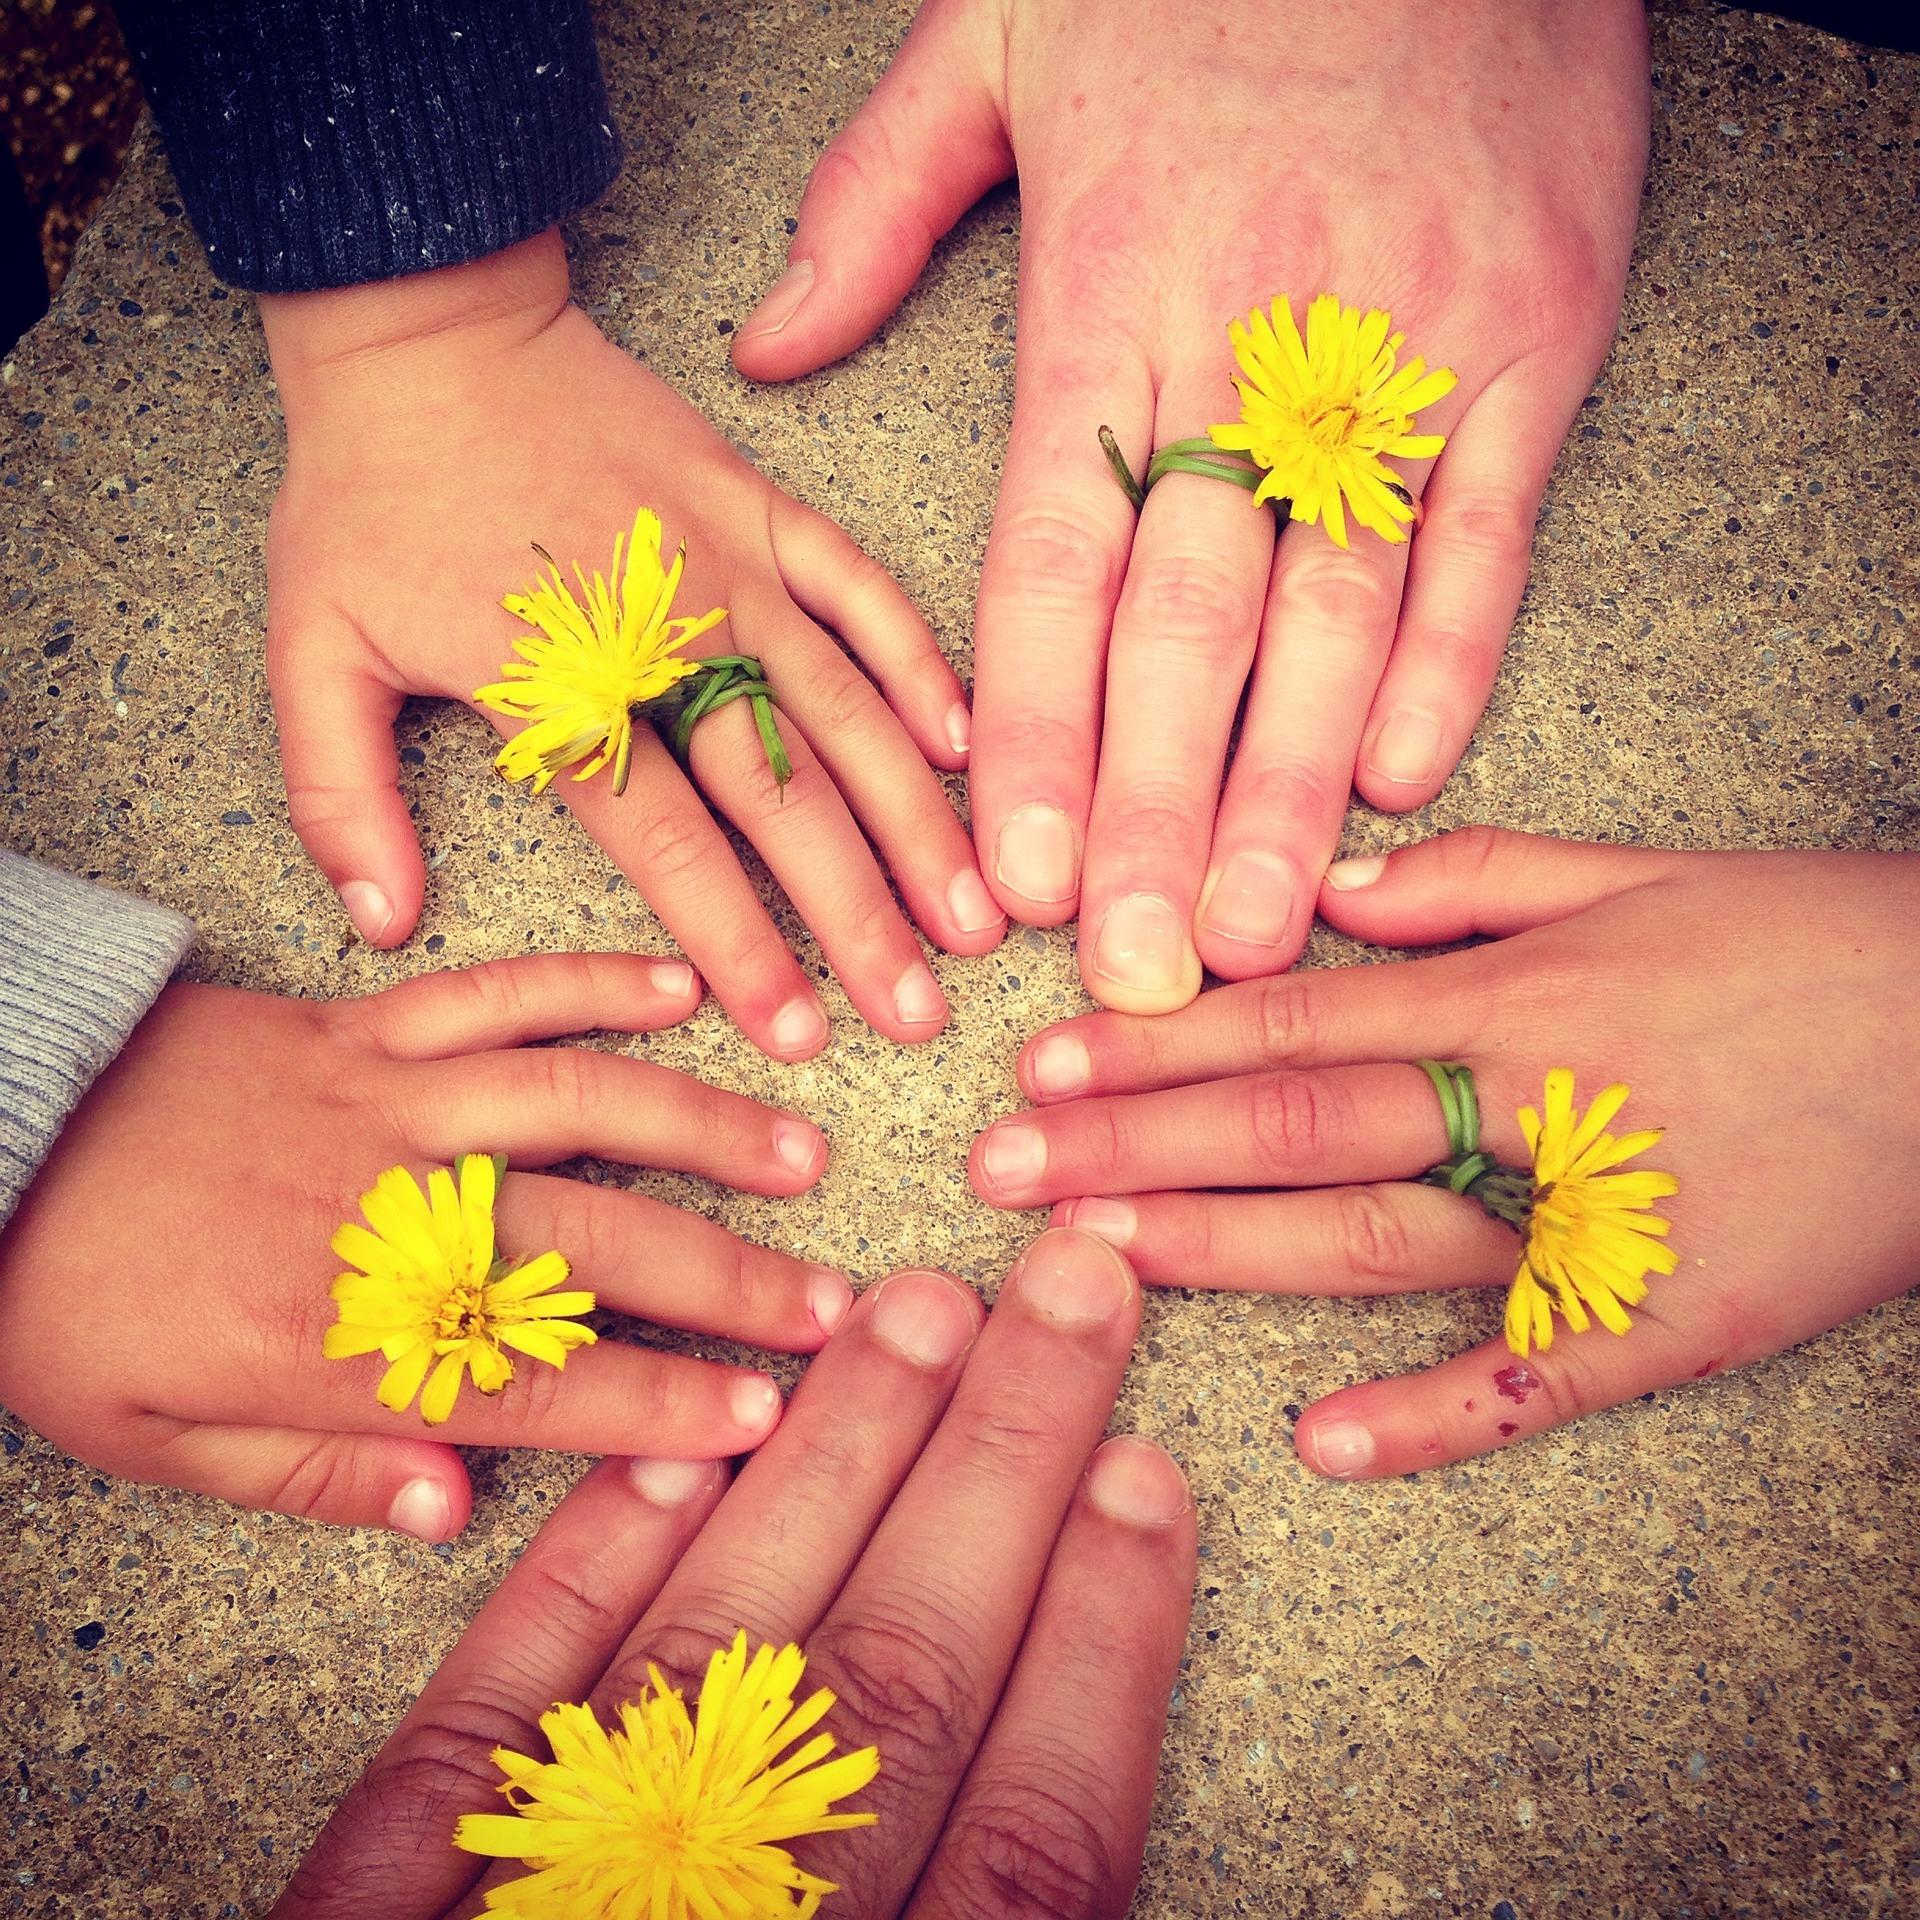 sa le faci cu familia la sfarsit de saptamana - sfatulparintilor.ro - pixabay-com - family-hand-1636615_1920